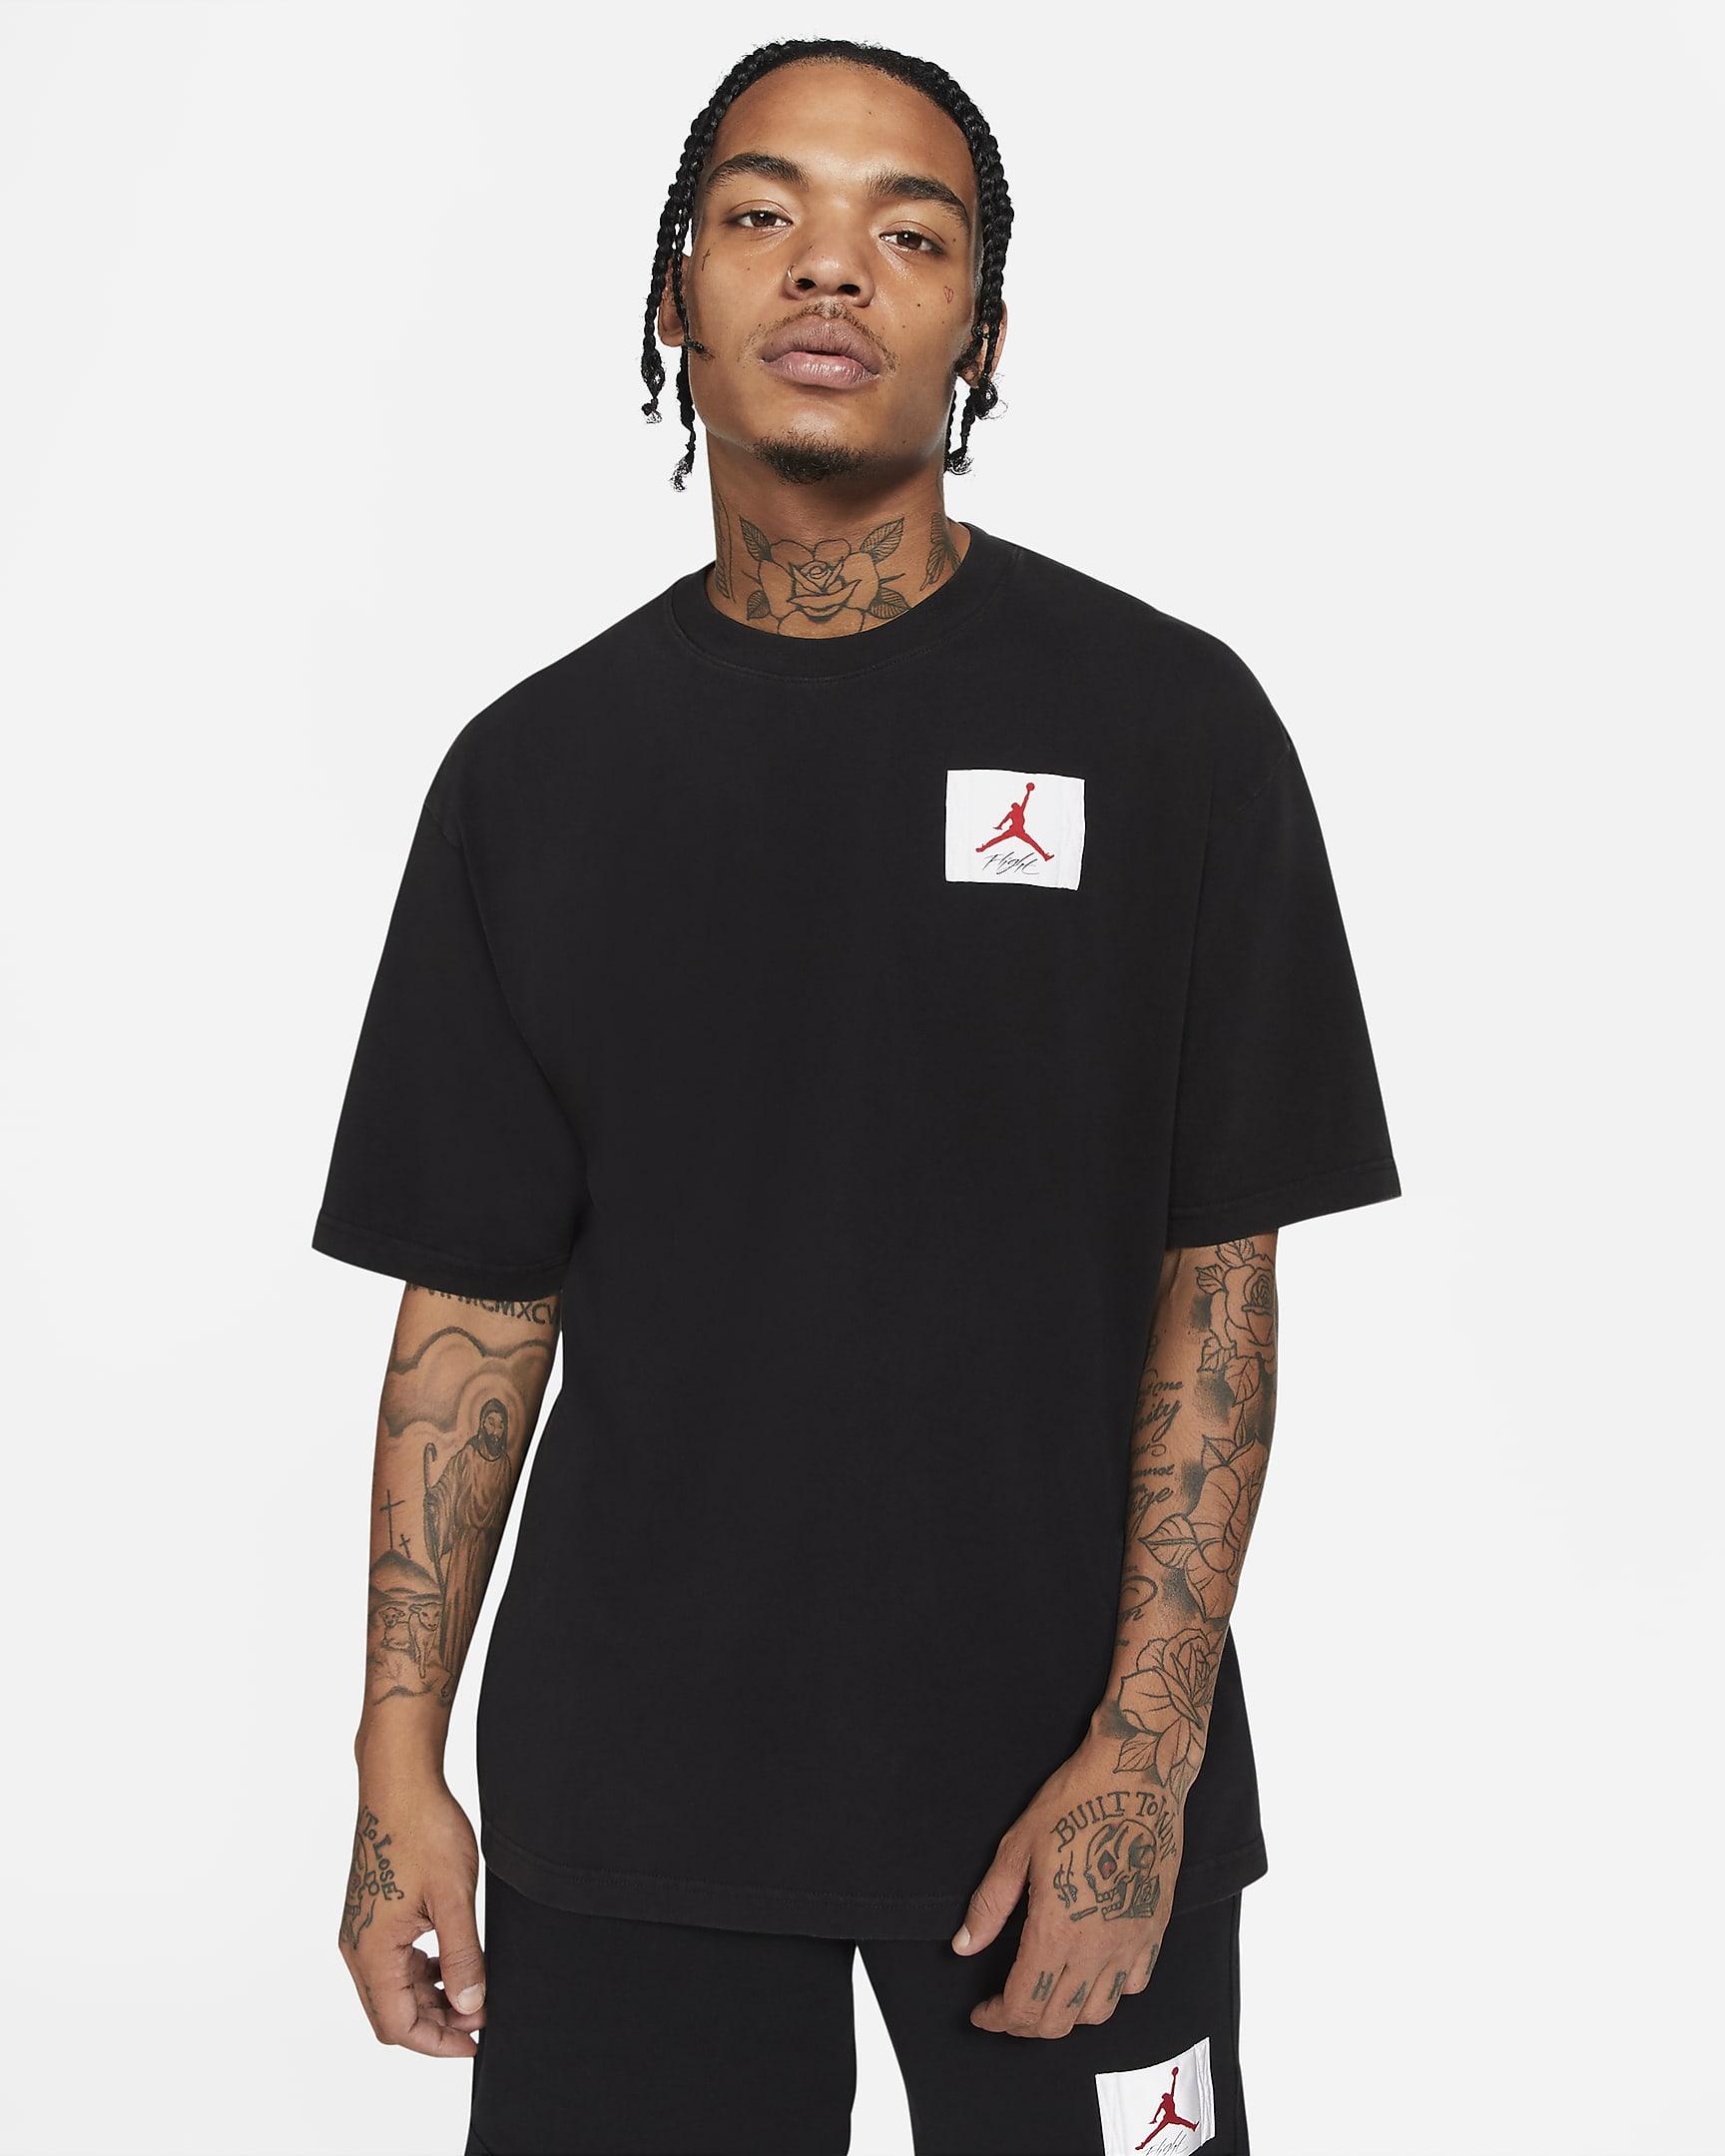 jordan-flight-mens-short-sleeve-t-shirt-C564t8